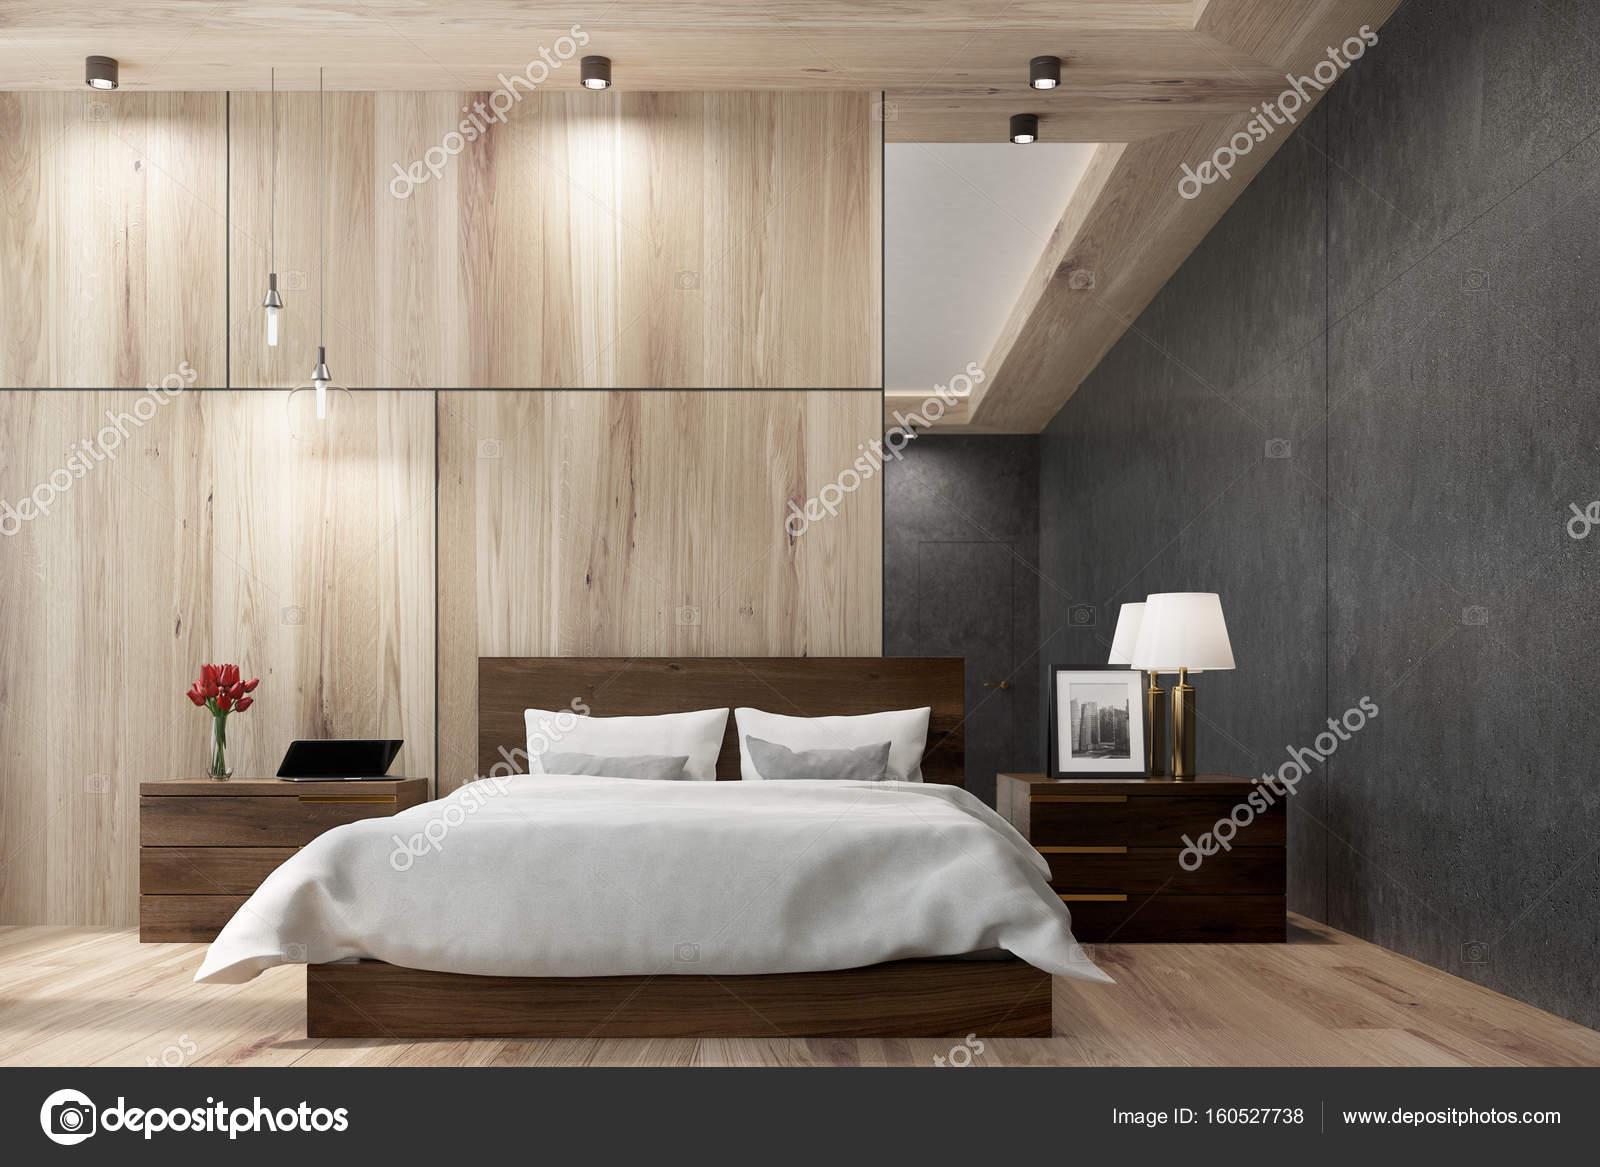 https://st3.depositphotos.com/2673929/16052/i/1600/depositphotos_160527738-stockafbeelding-zwart-en-houten-slaapkamer-spiegel.jpg